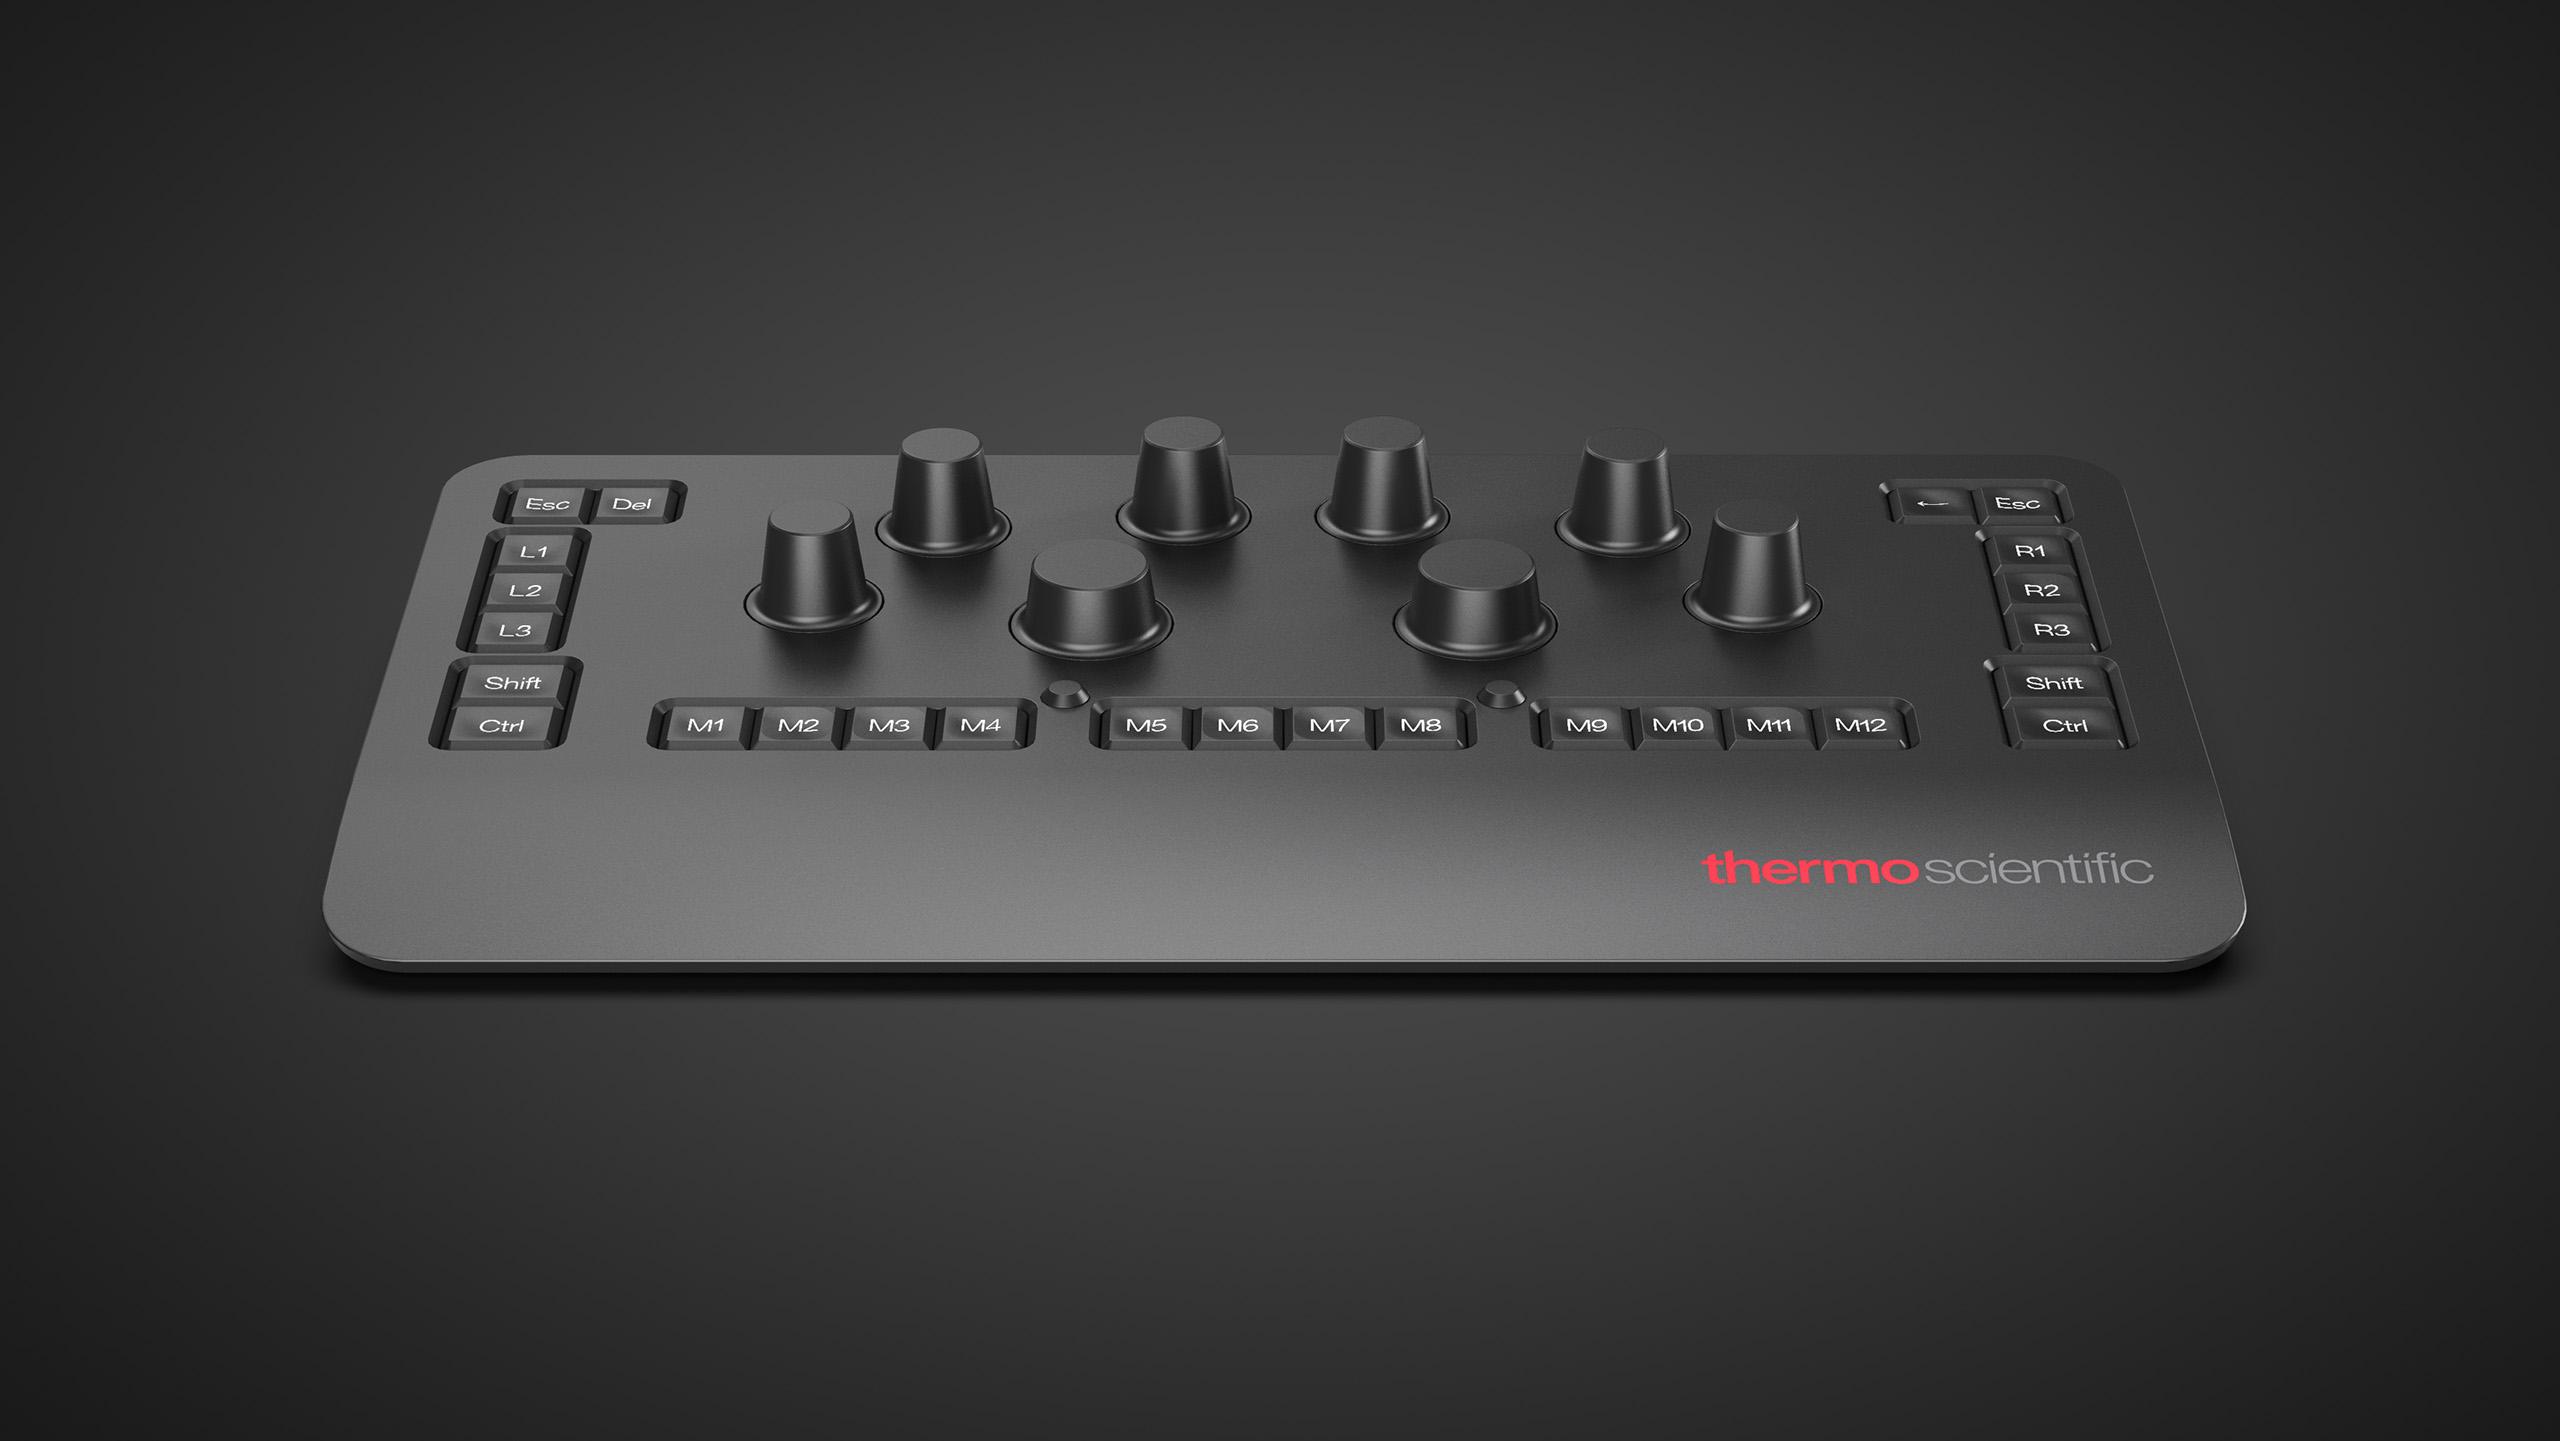 intro thermo scientific keyboard